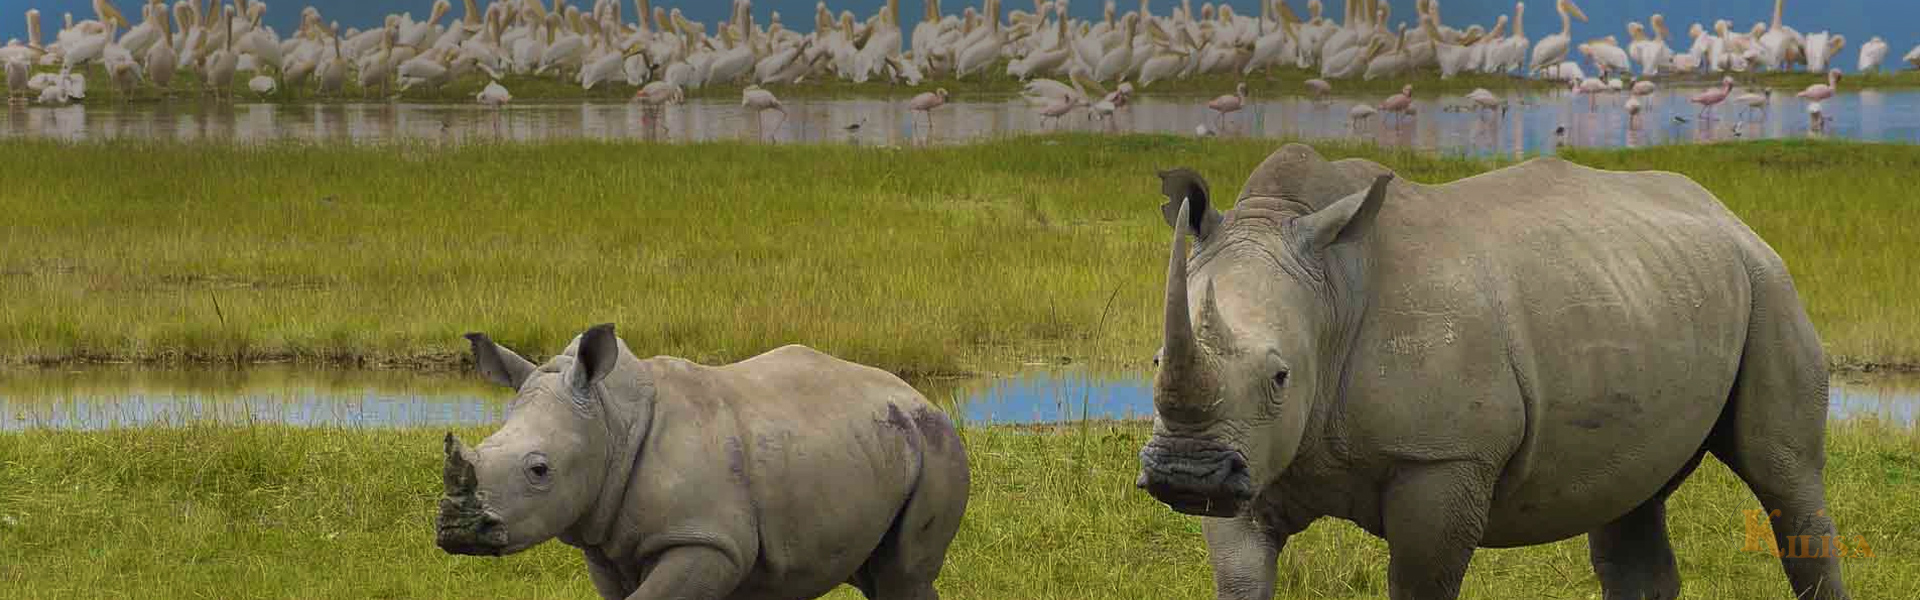 Tanzania Wildlife Safari (Moshi / Lake Manyara / Ngorongoro Crater / Serengeti)